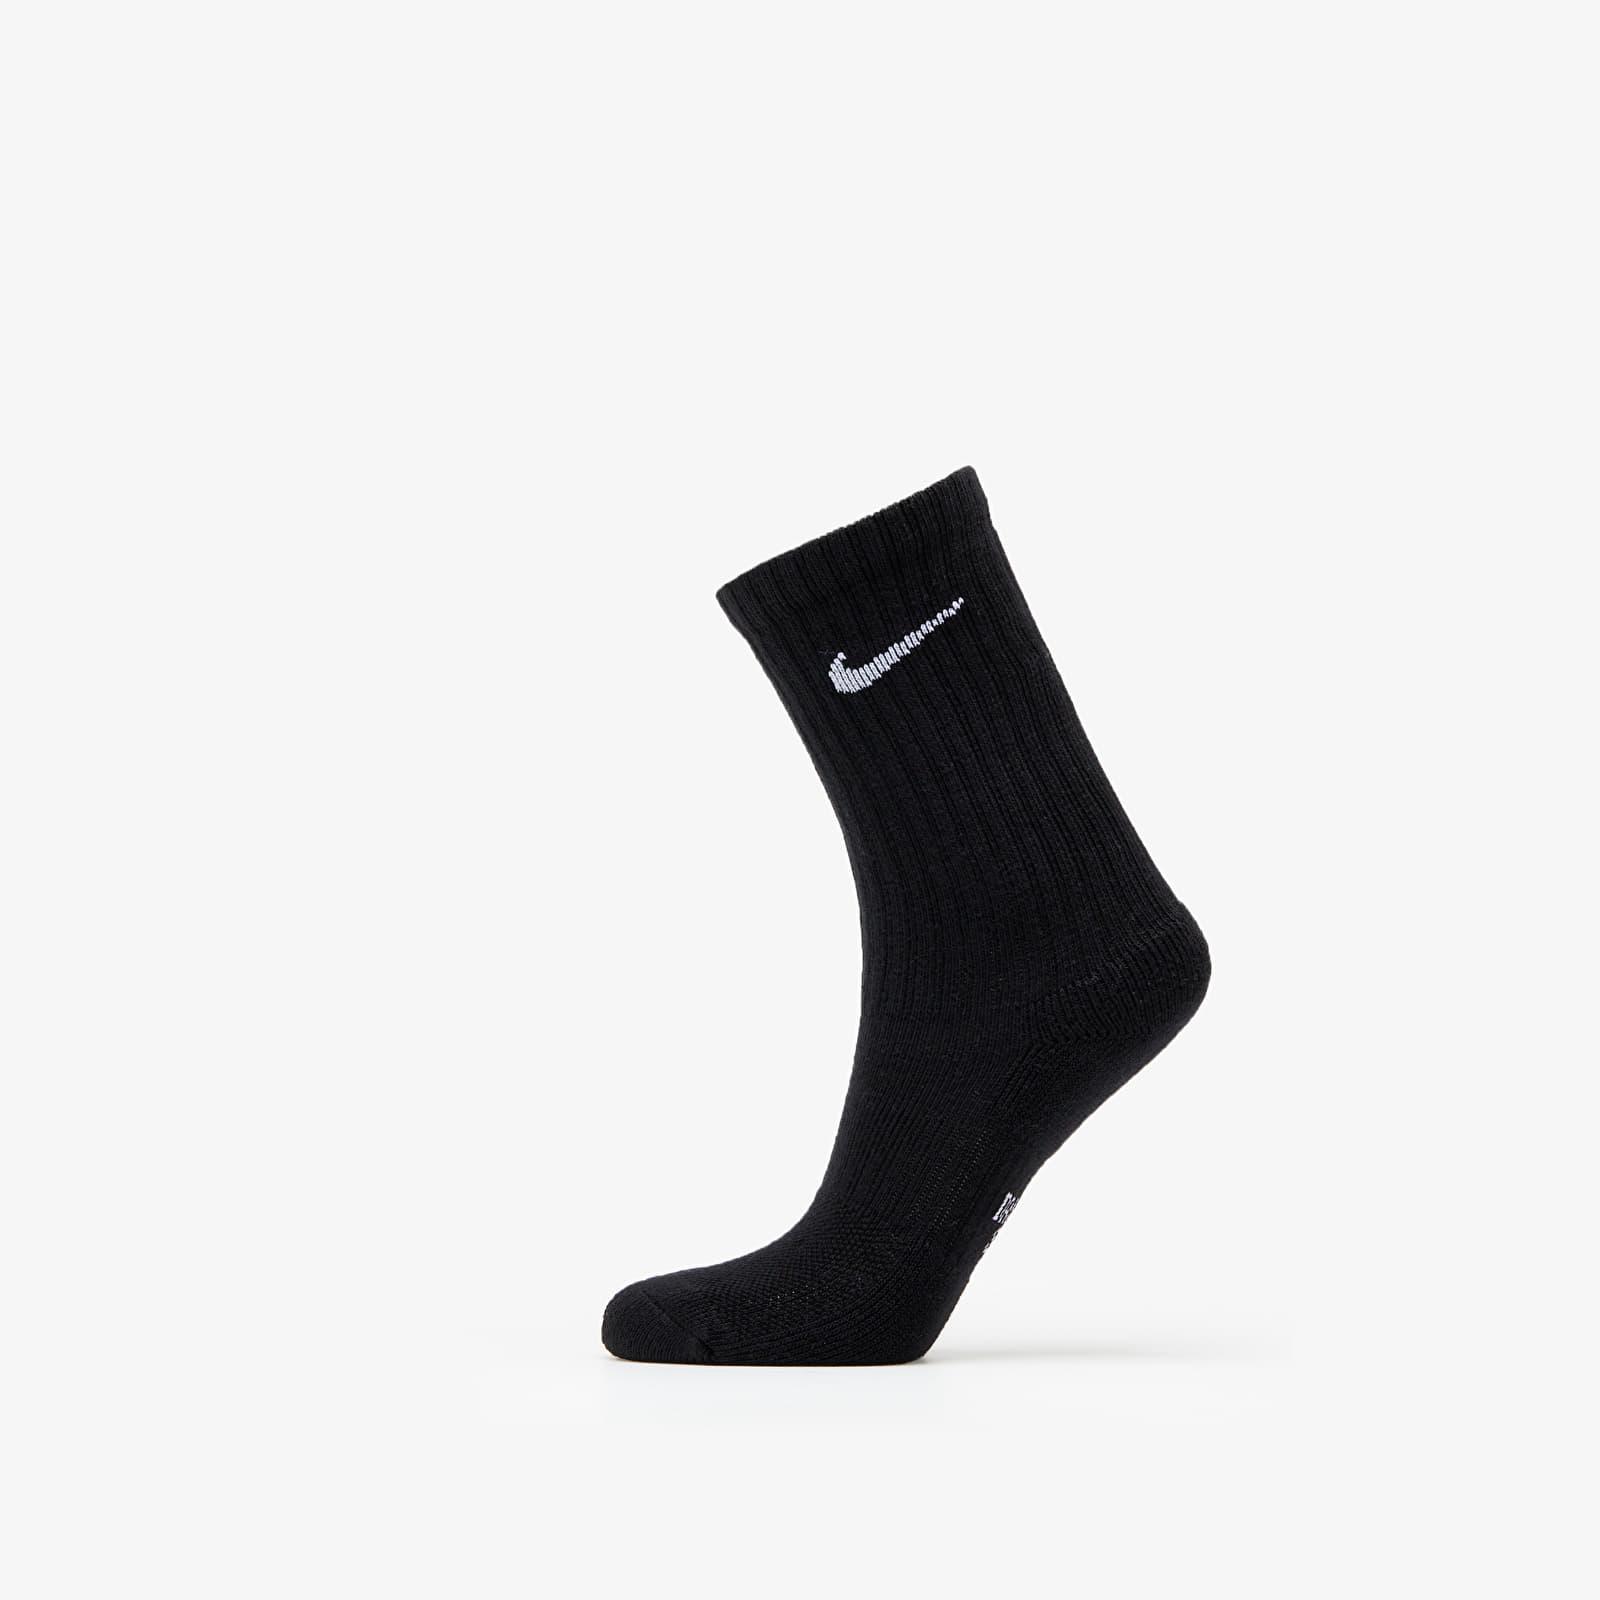 Socks Nike Y Nike Evry Cush Crew 3 Pack Socks Black/ White